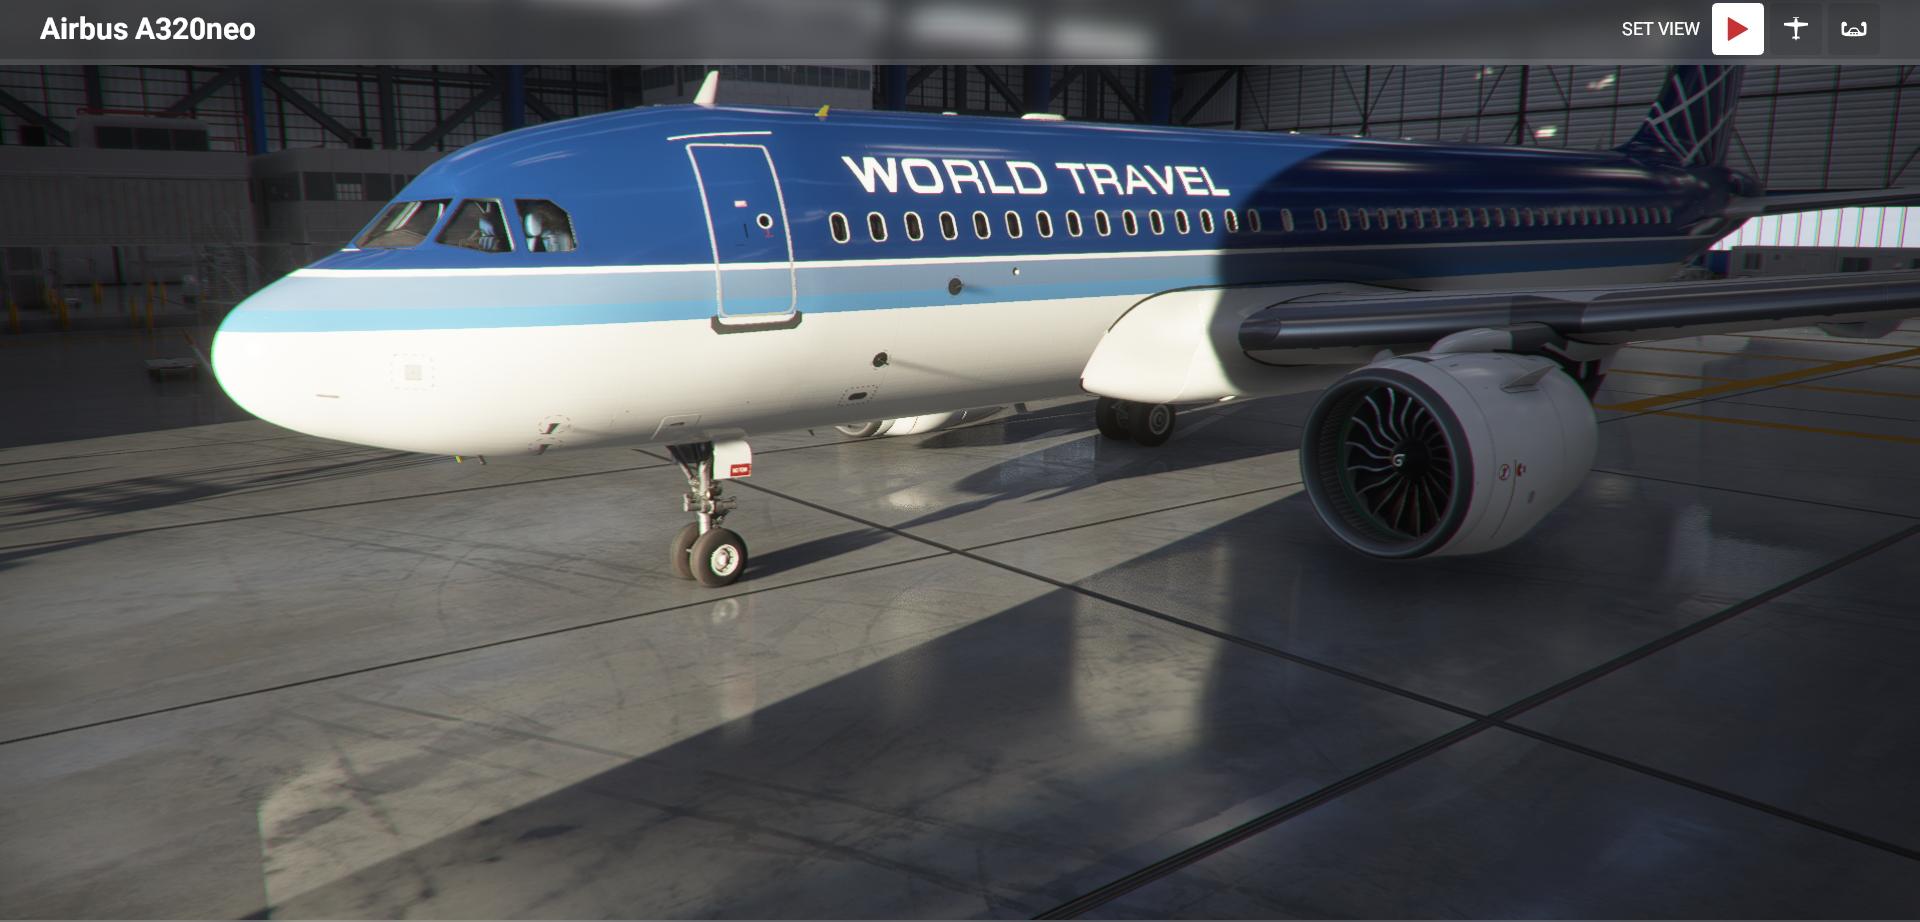 Microsoft Flight Simulator Airbus A320neo